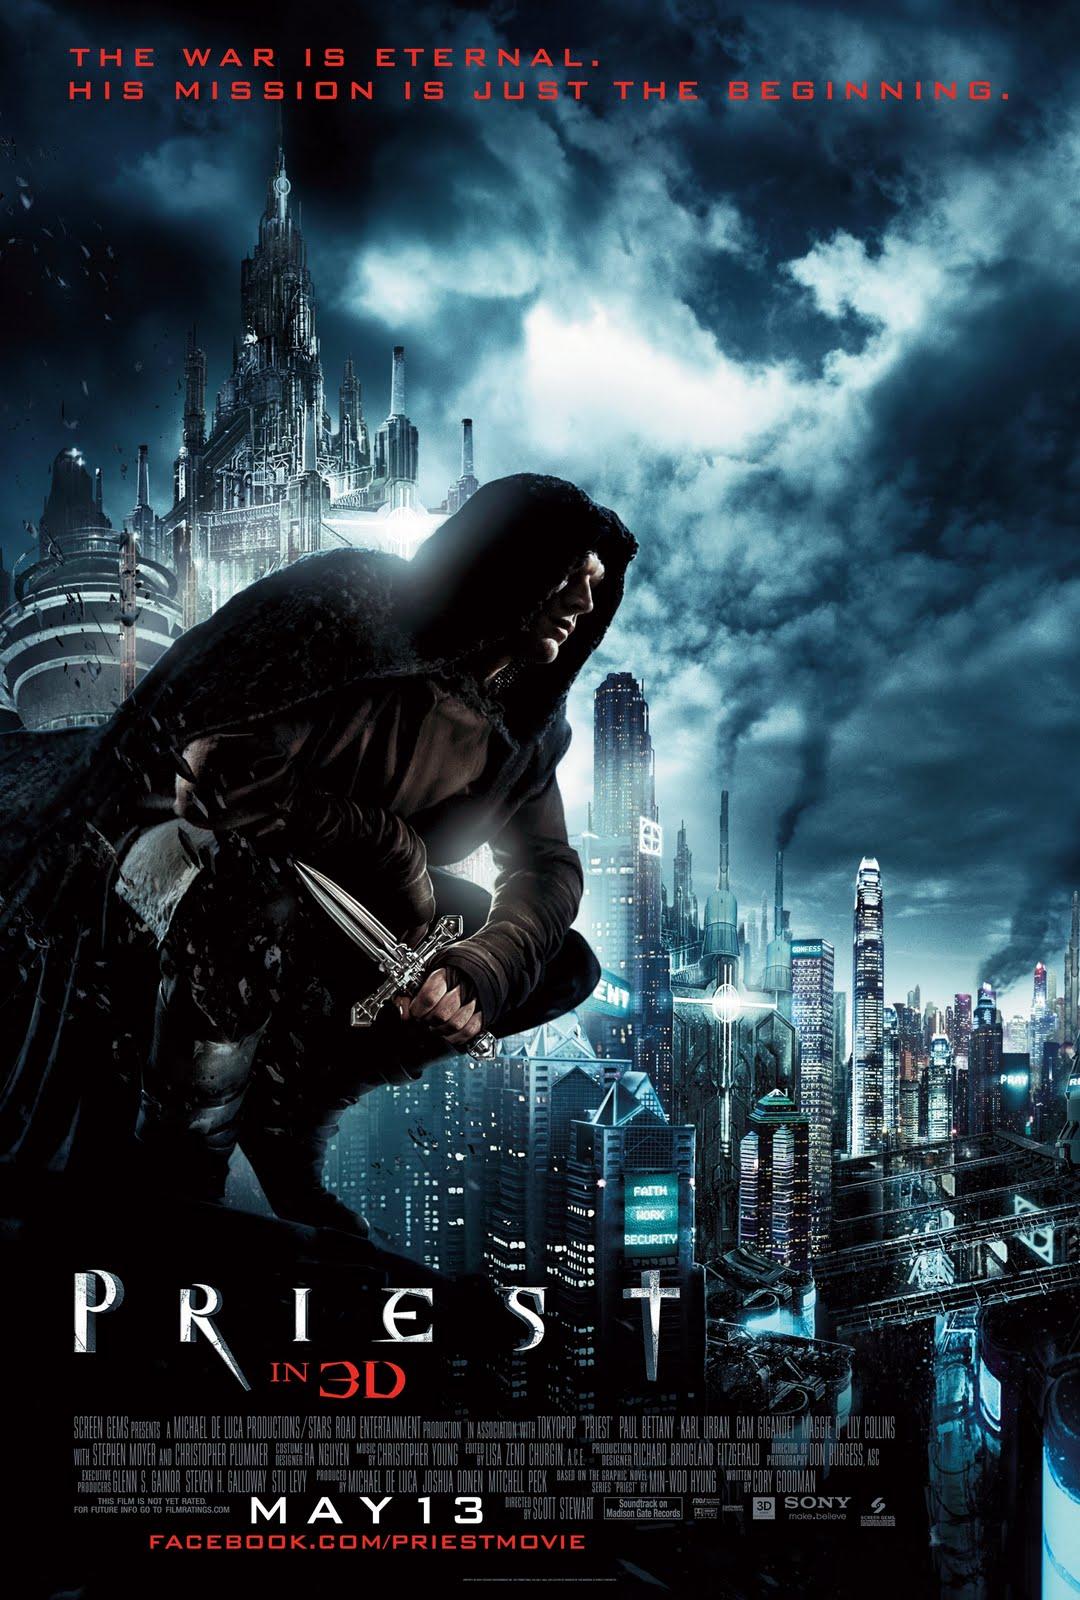 http://3.bp.blogspot.com/-sm-hFwKSHZ8/TZvf-pNr4HI/AAAAAAAADLQ/tASbOts_N0Y/s1600/Priest_new_Poster.jpg